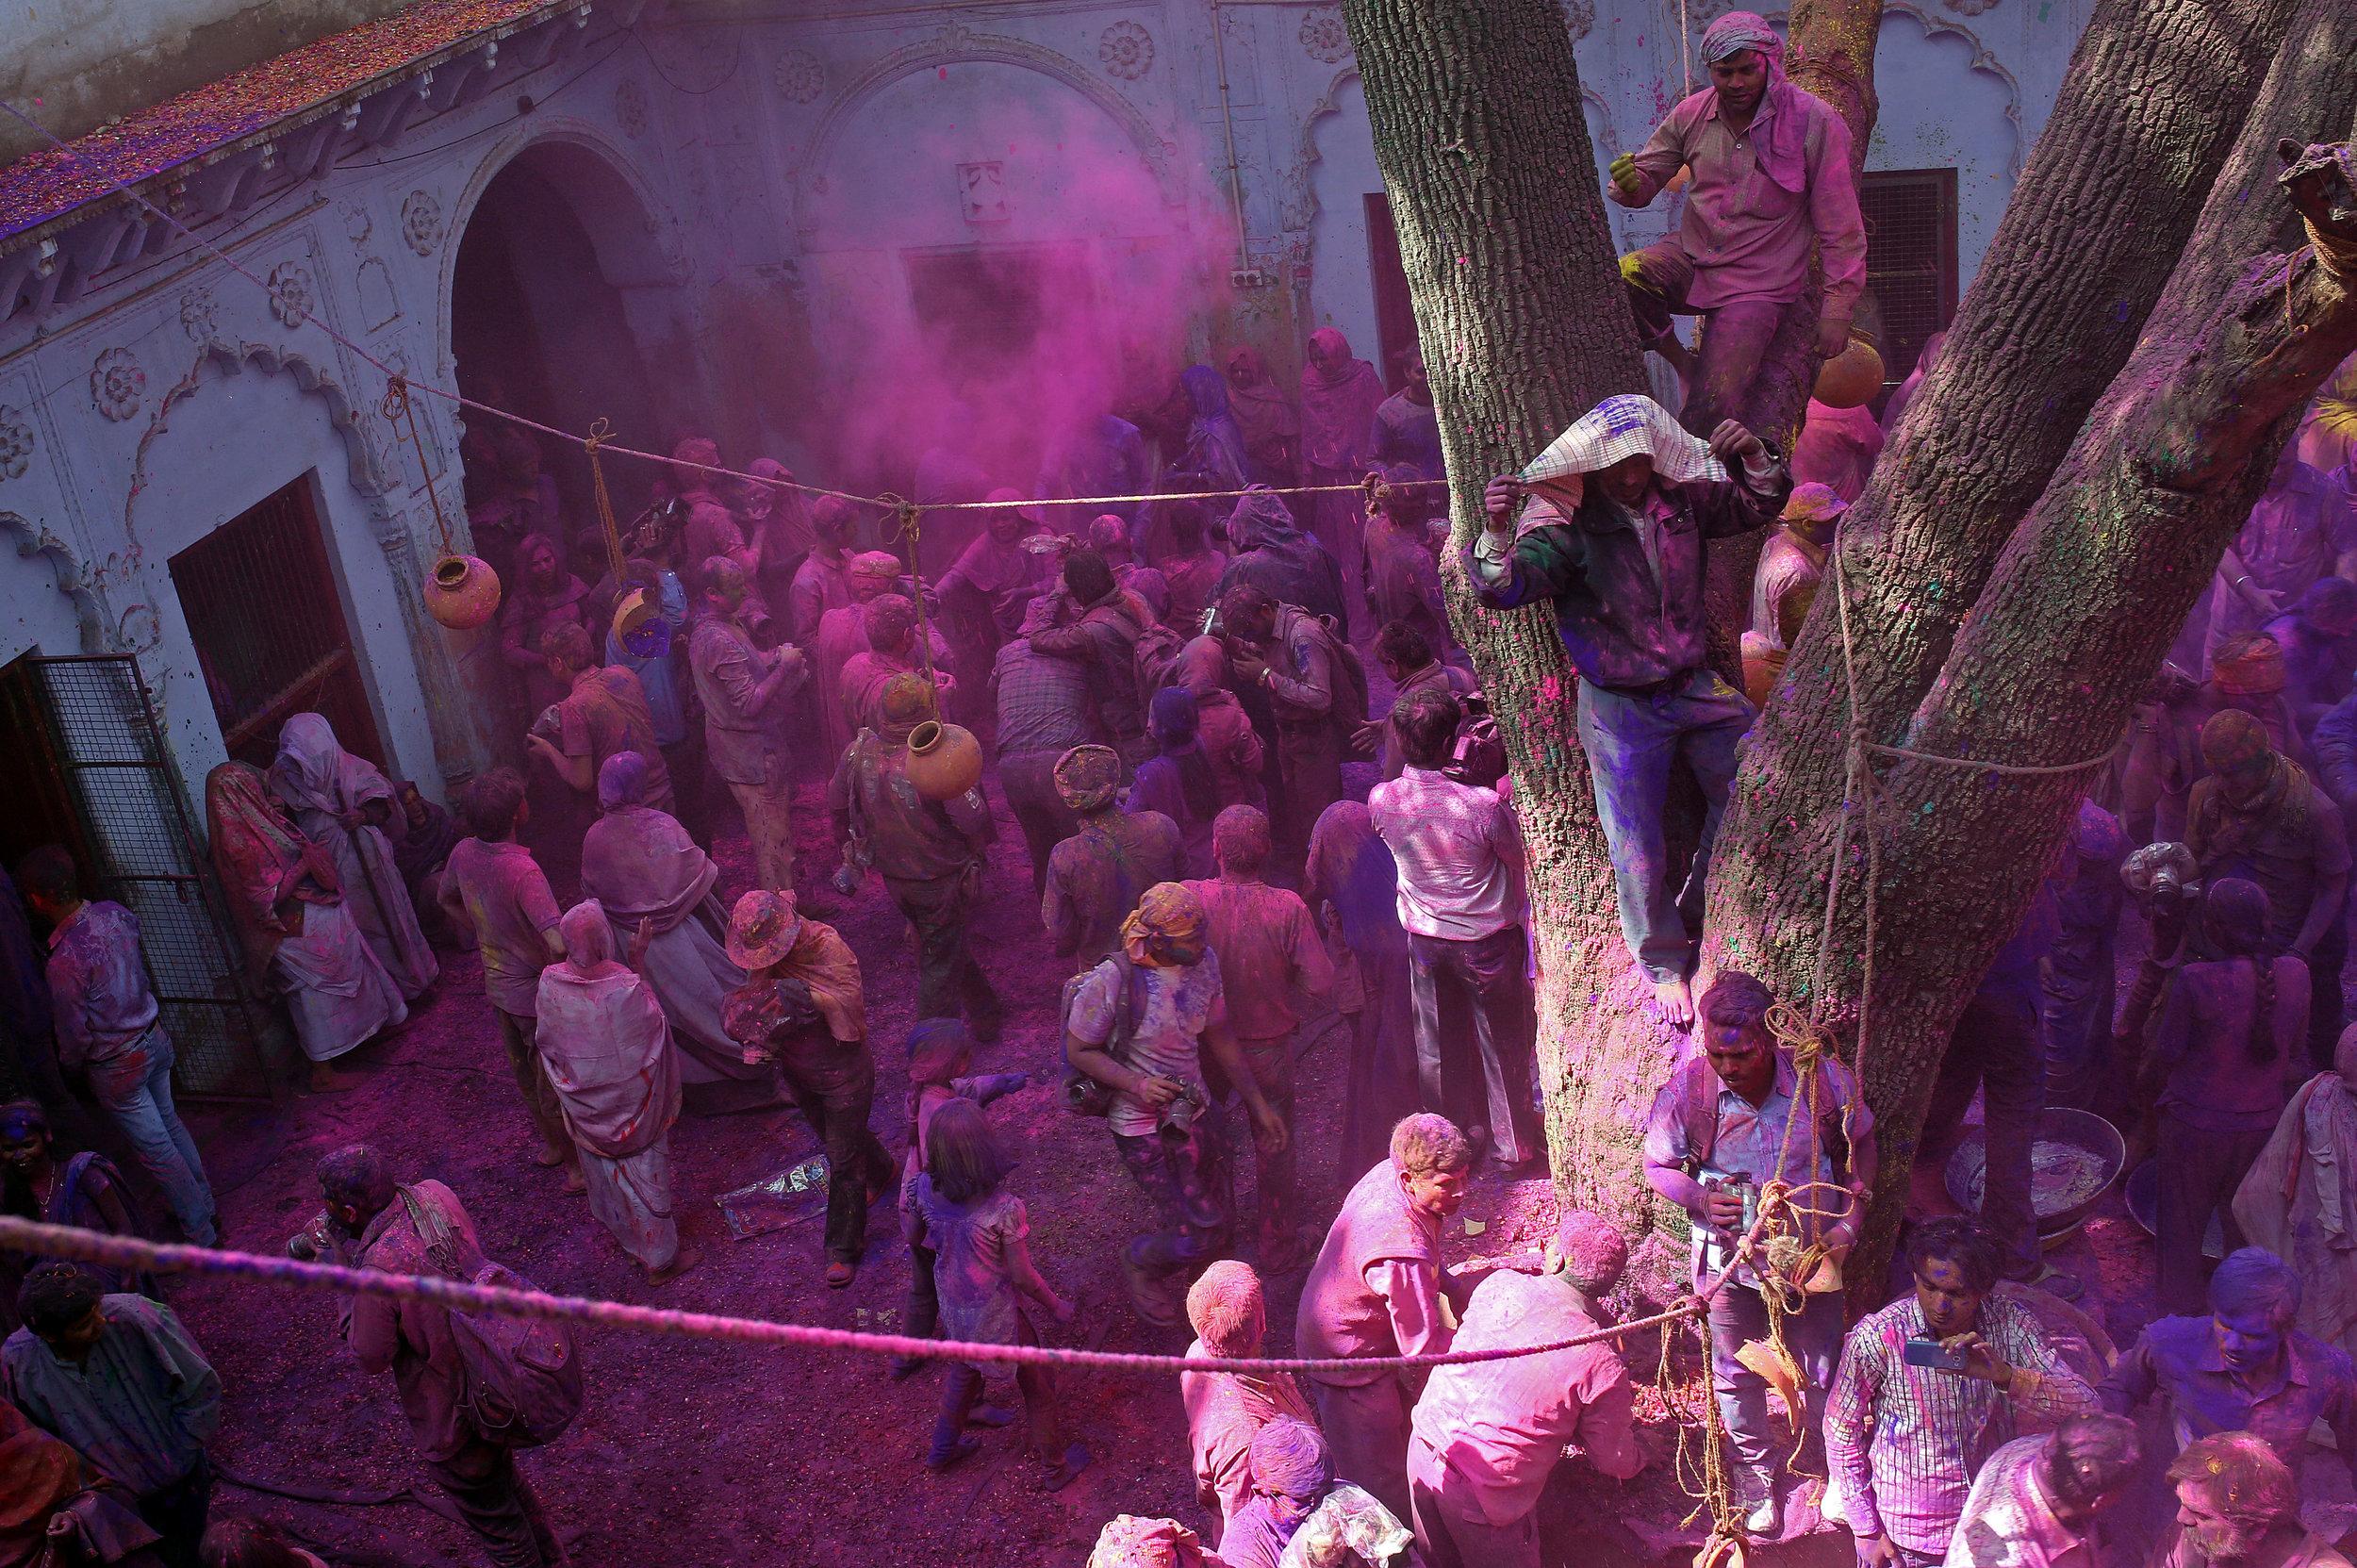 Uttar Pradesh Holi Festival34.jpg